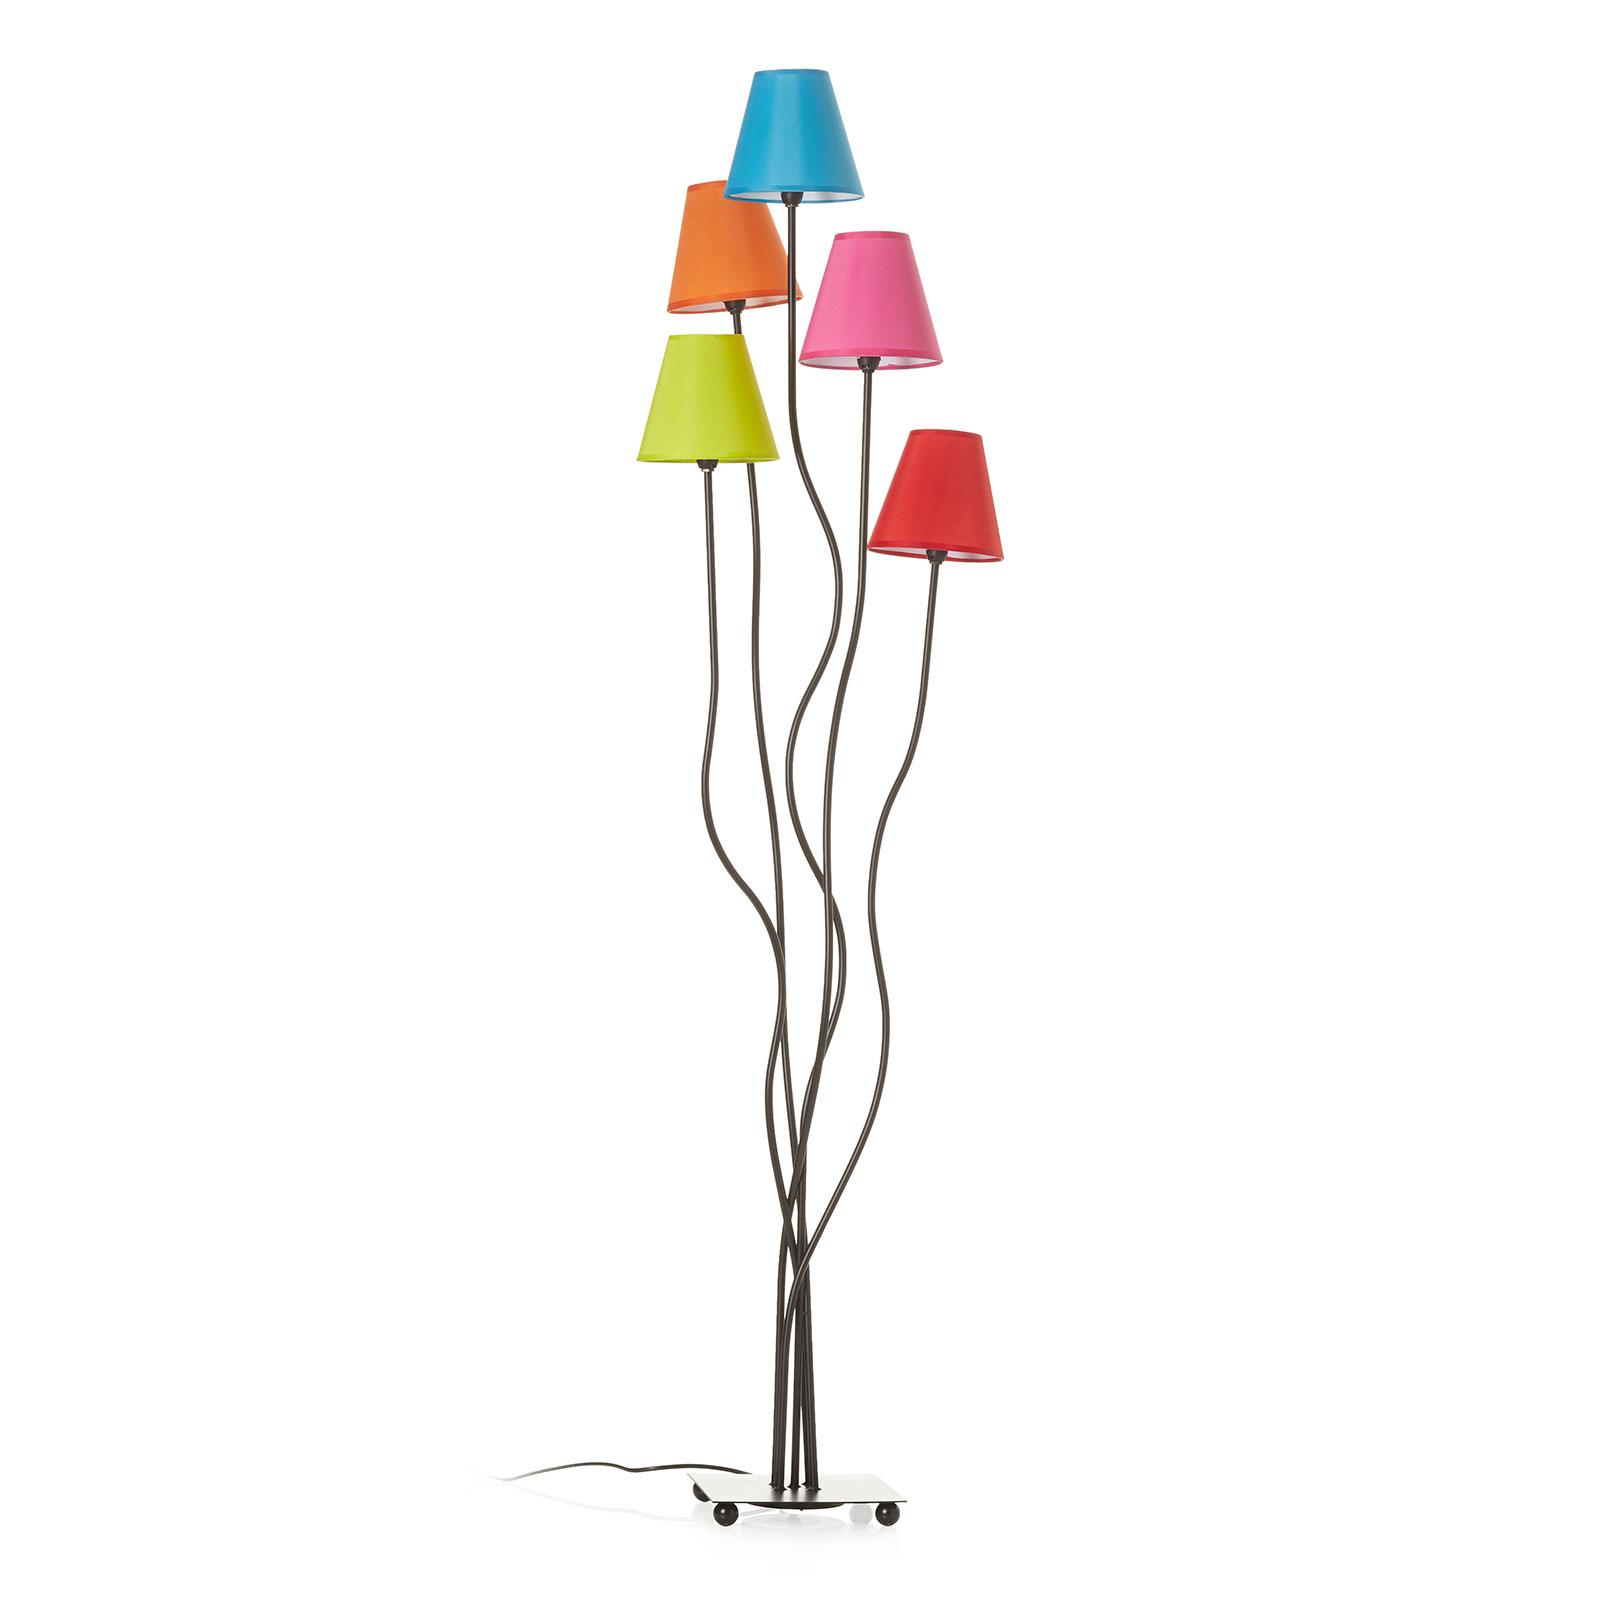 Vloerlamp van textiel Colori 5-lamps multicolor